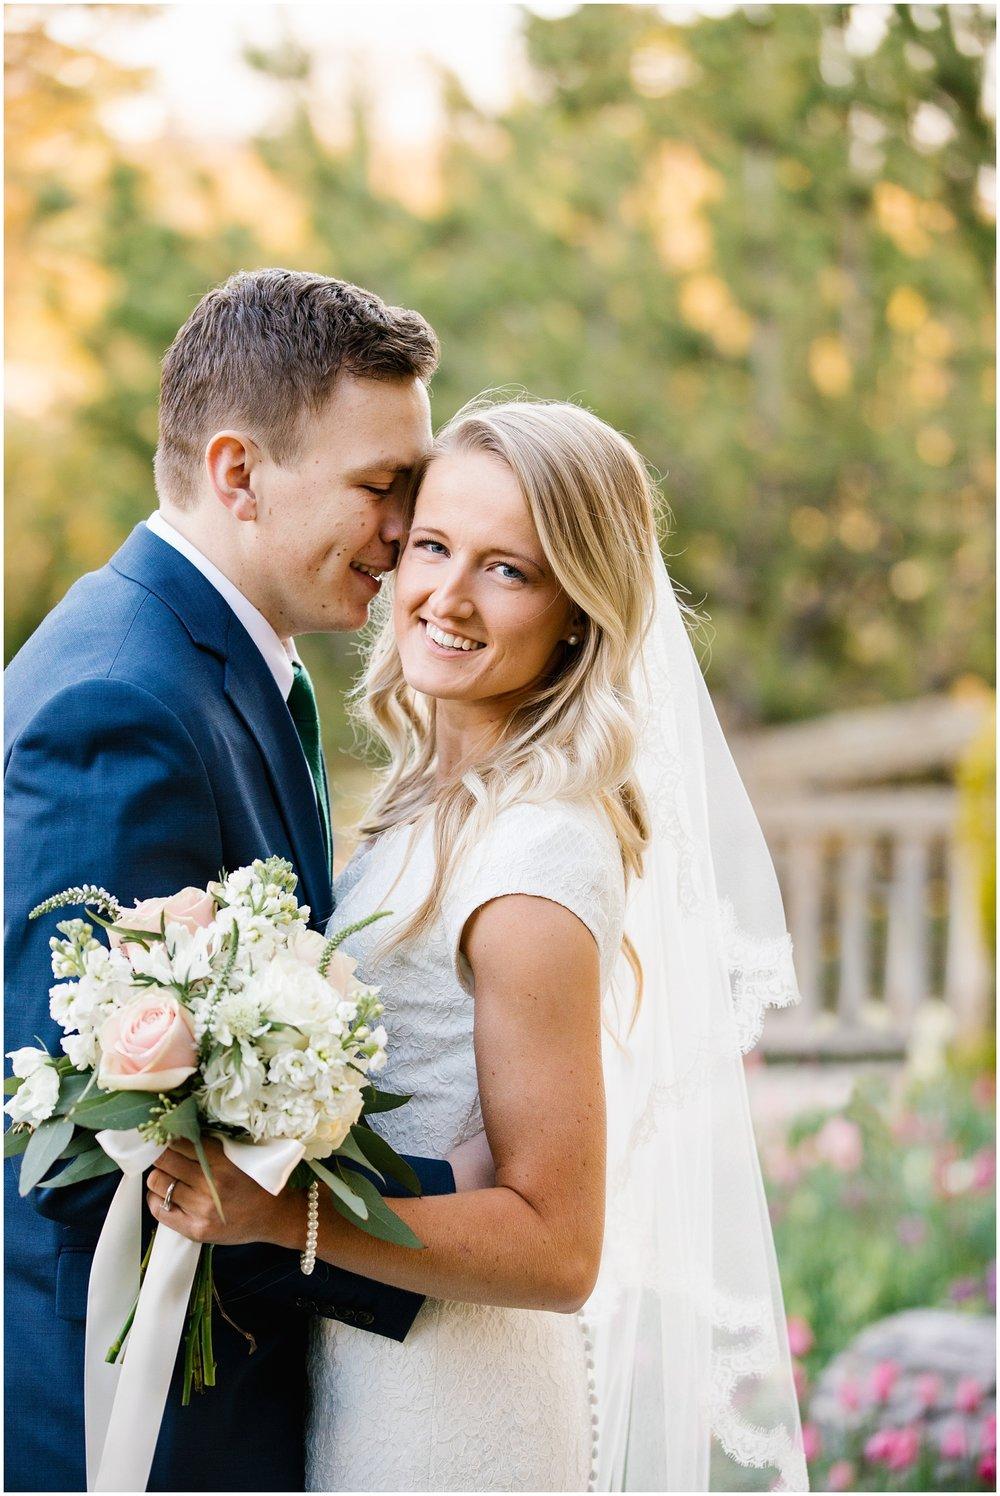 TA-Bridals-53_Lizzie-B-Imagery-Utah-Wedding-Photographer-Park-City-Salt-Lake-City-Thanksgiving-Point-Ashton-Gardens-Lehi-Utah.jpg